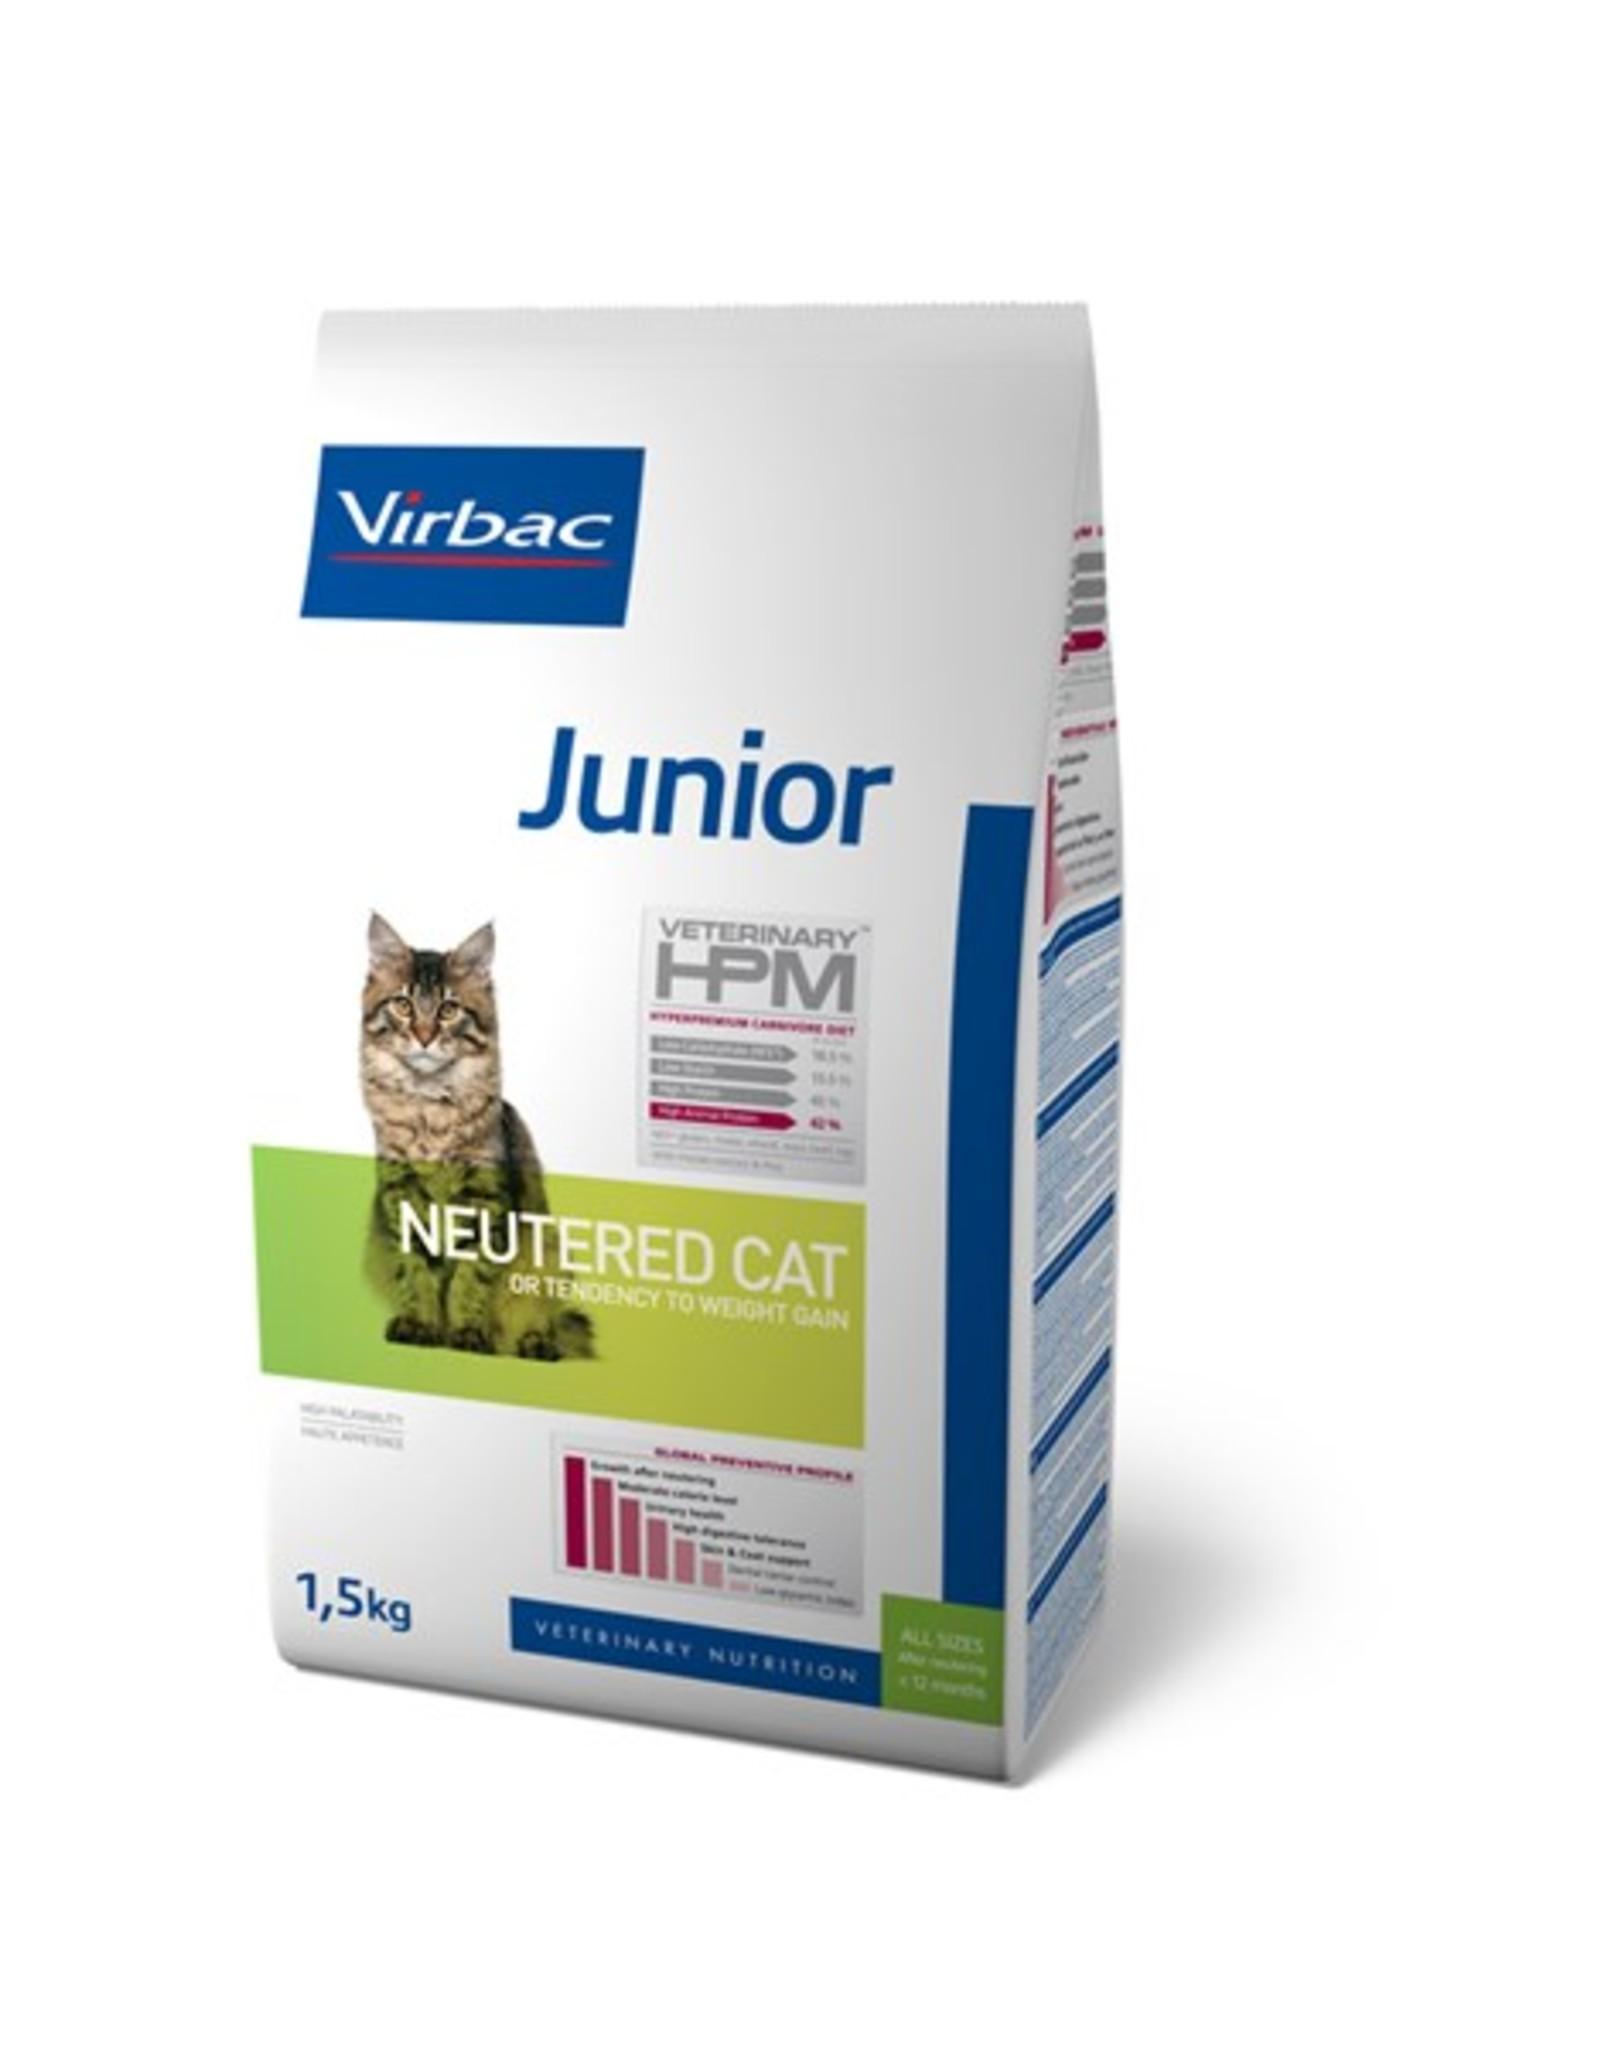 Virbac Virbac Hpm Katze Neutered Junior 1,5kg